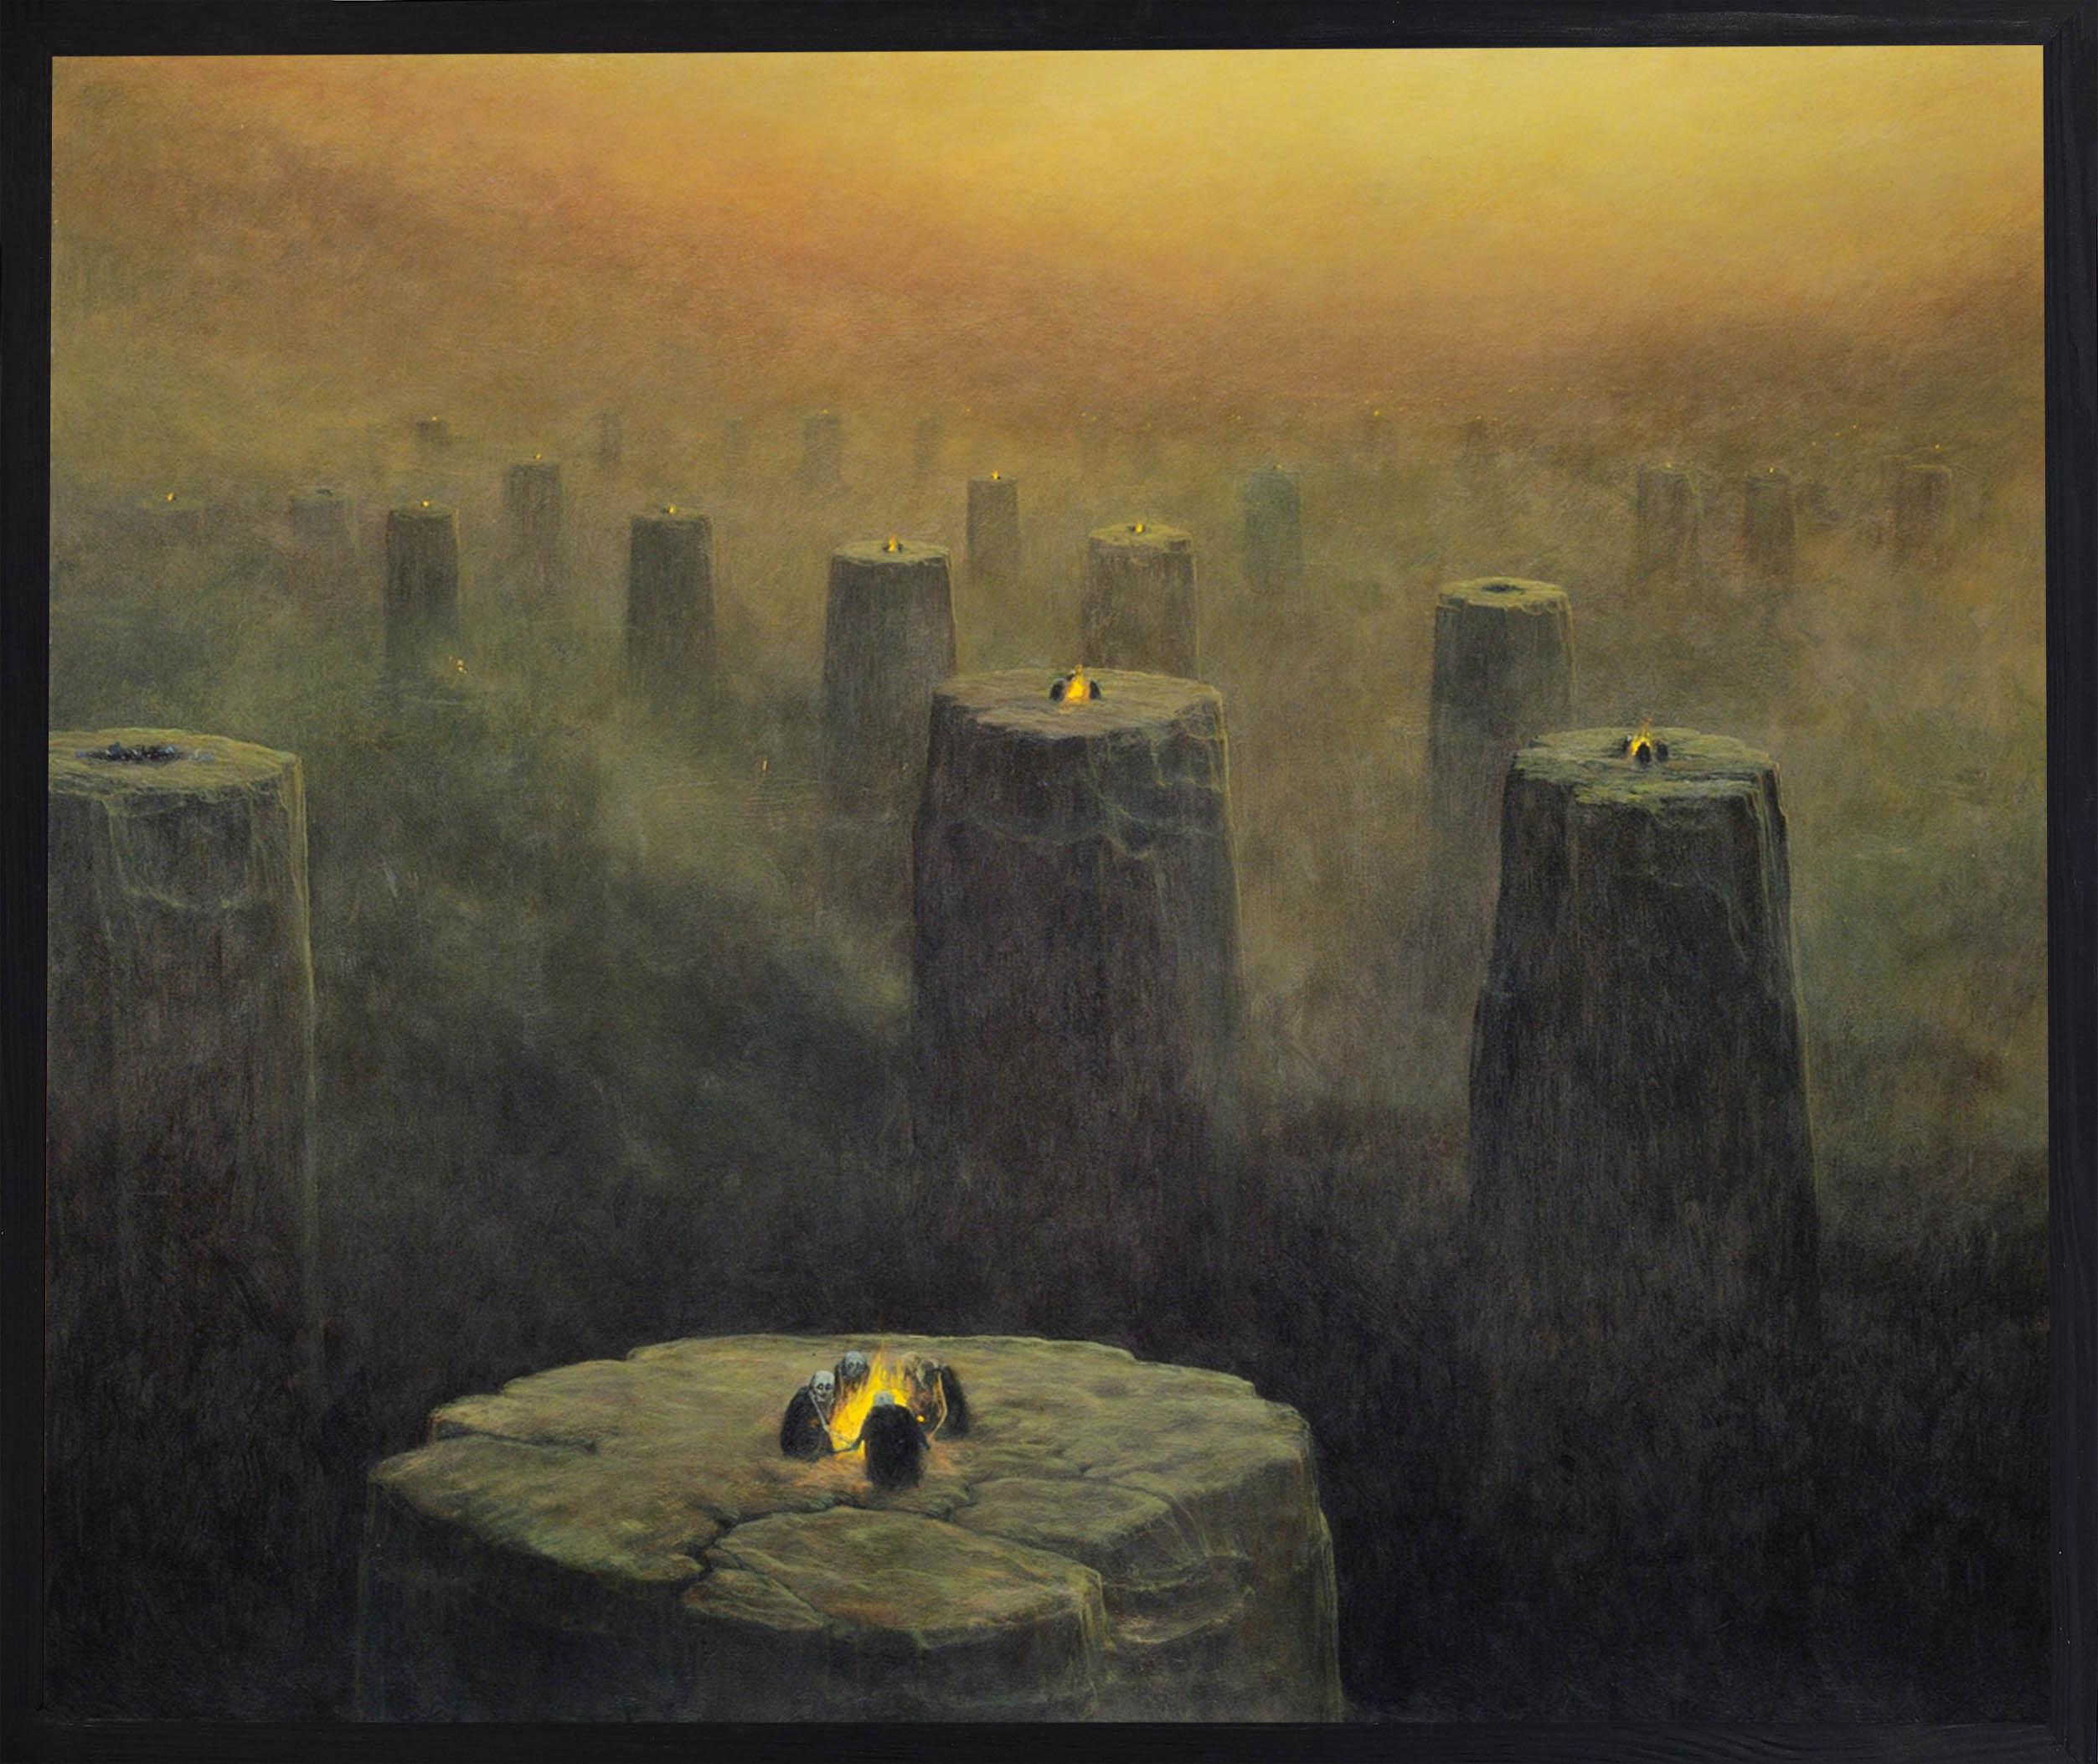 Zdzislaw Beksinski - painting AC75 - BeksStore.com